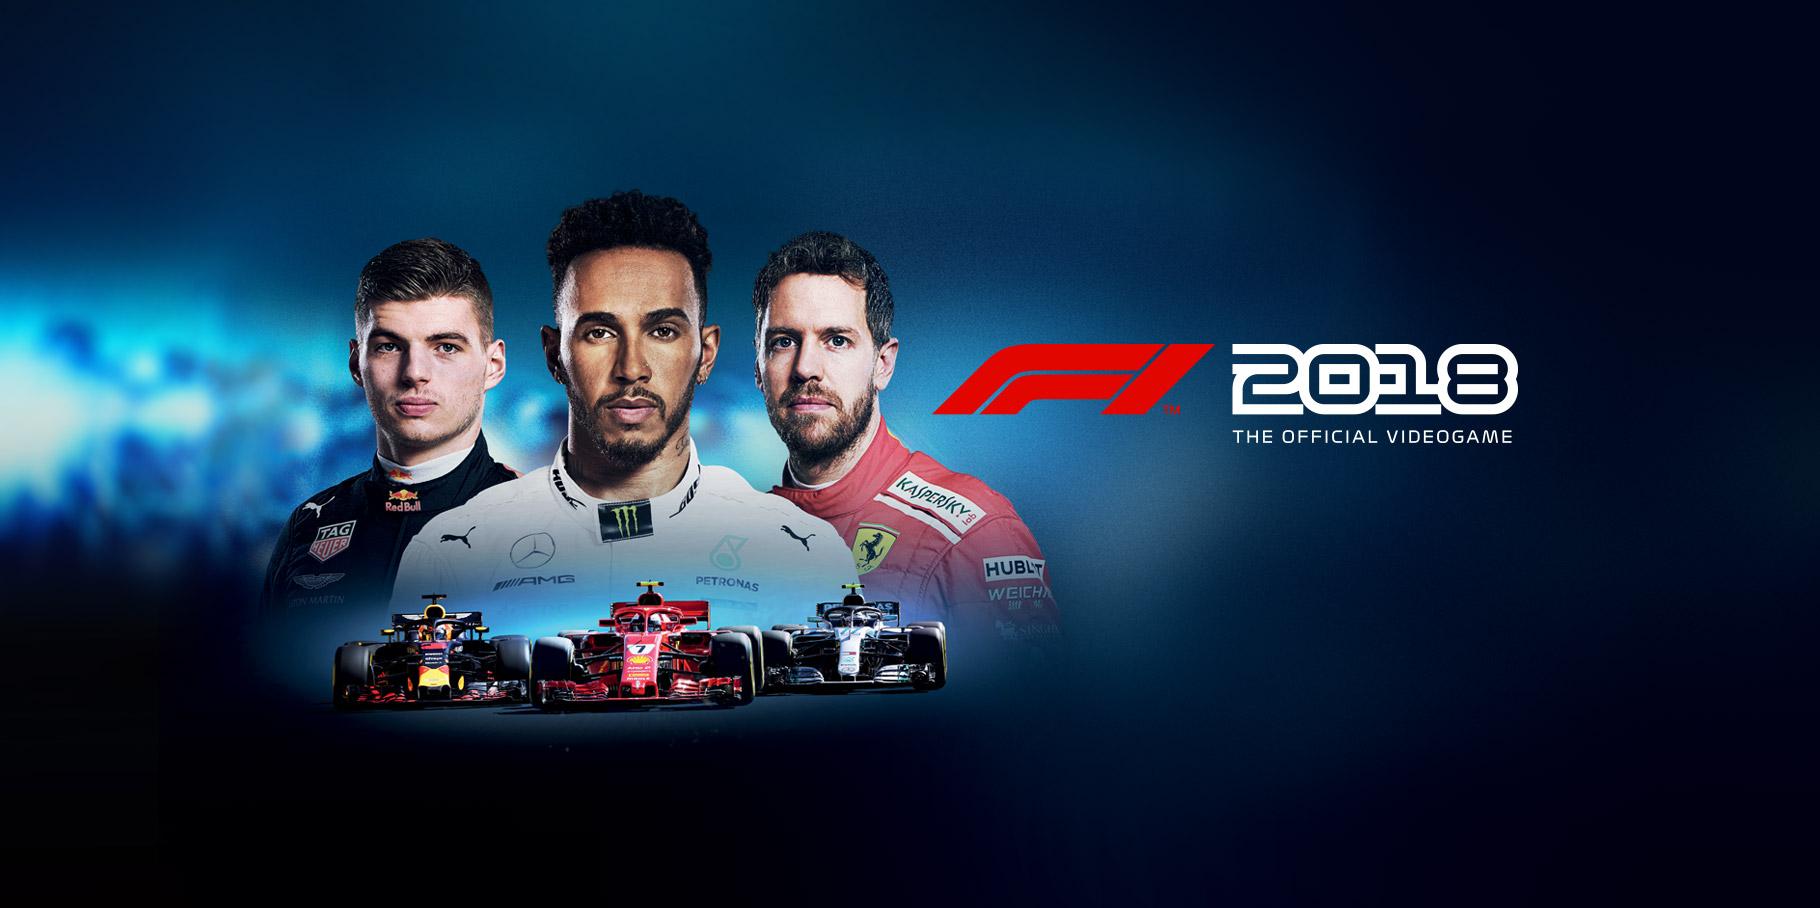 Humble Bundle бесплатно раздает F1 2018